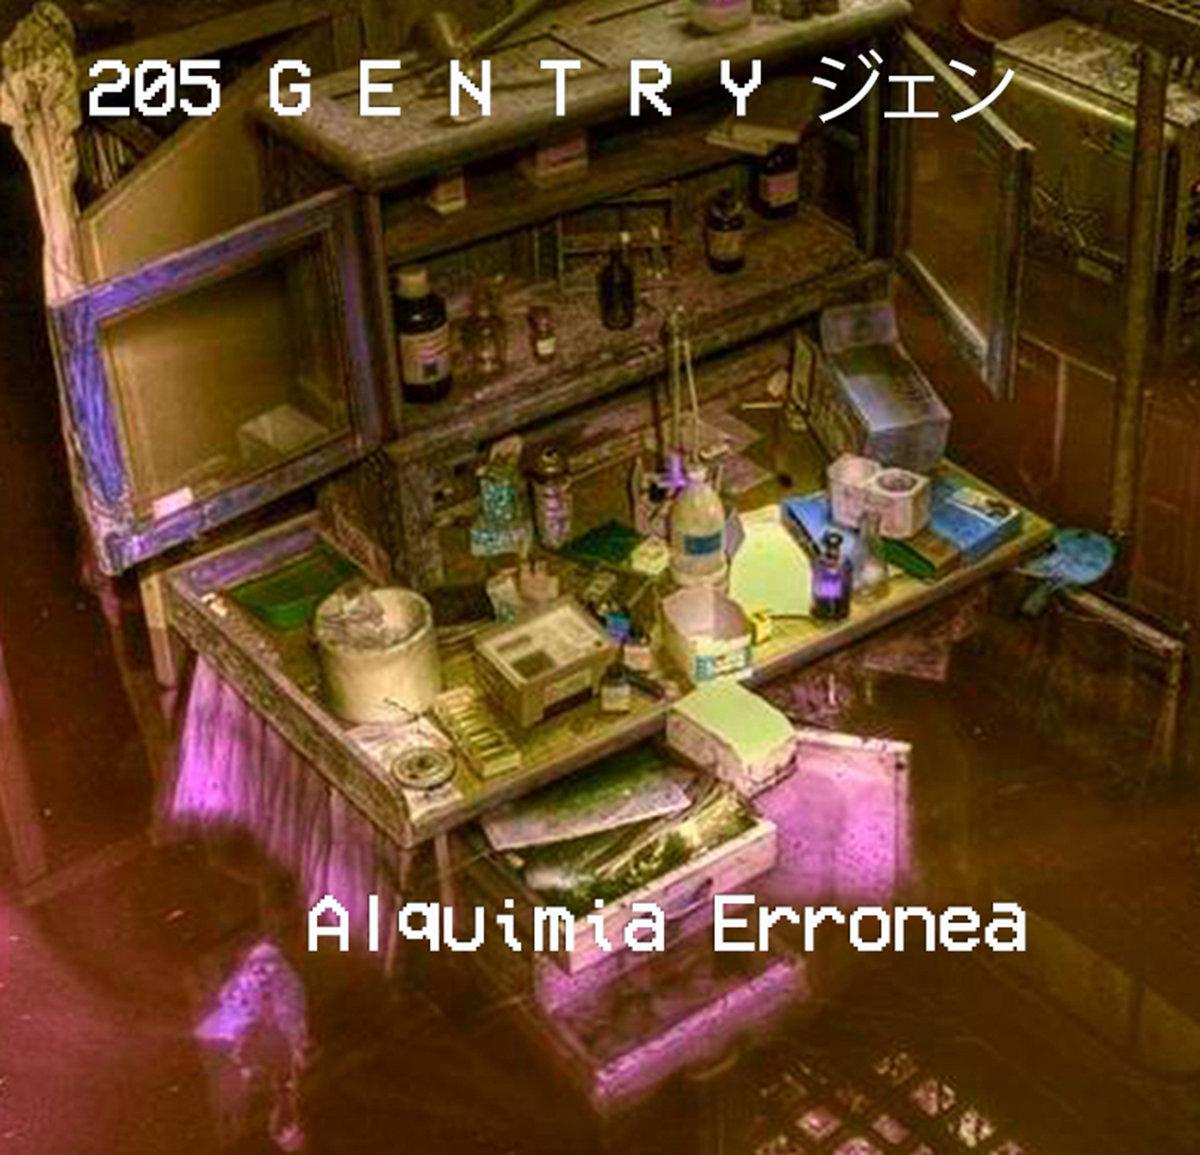 205 G E N T R Y ジェン - Alquimia Erronea